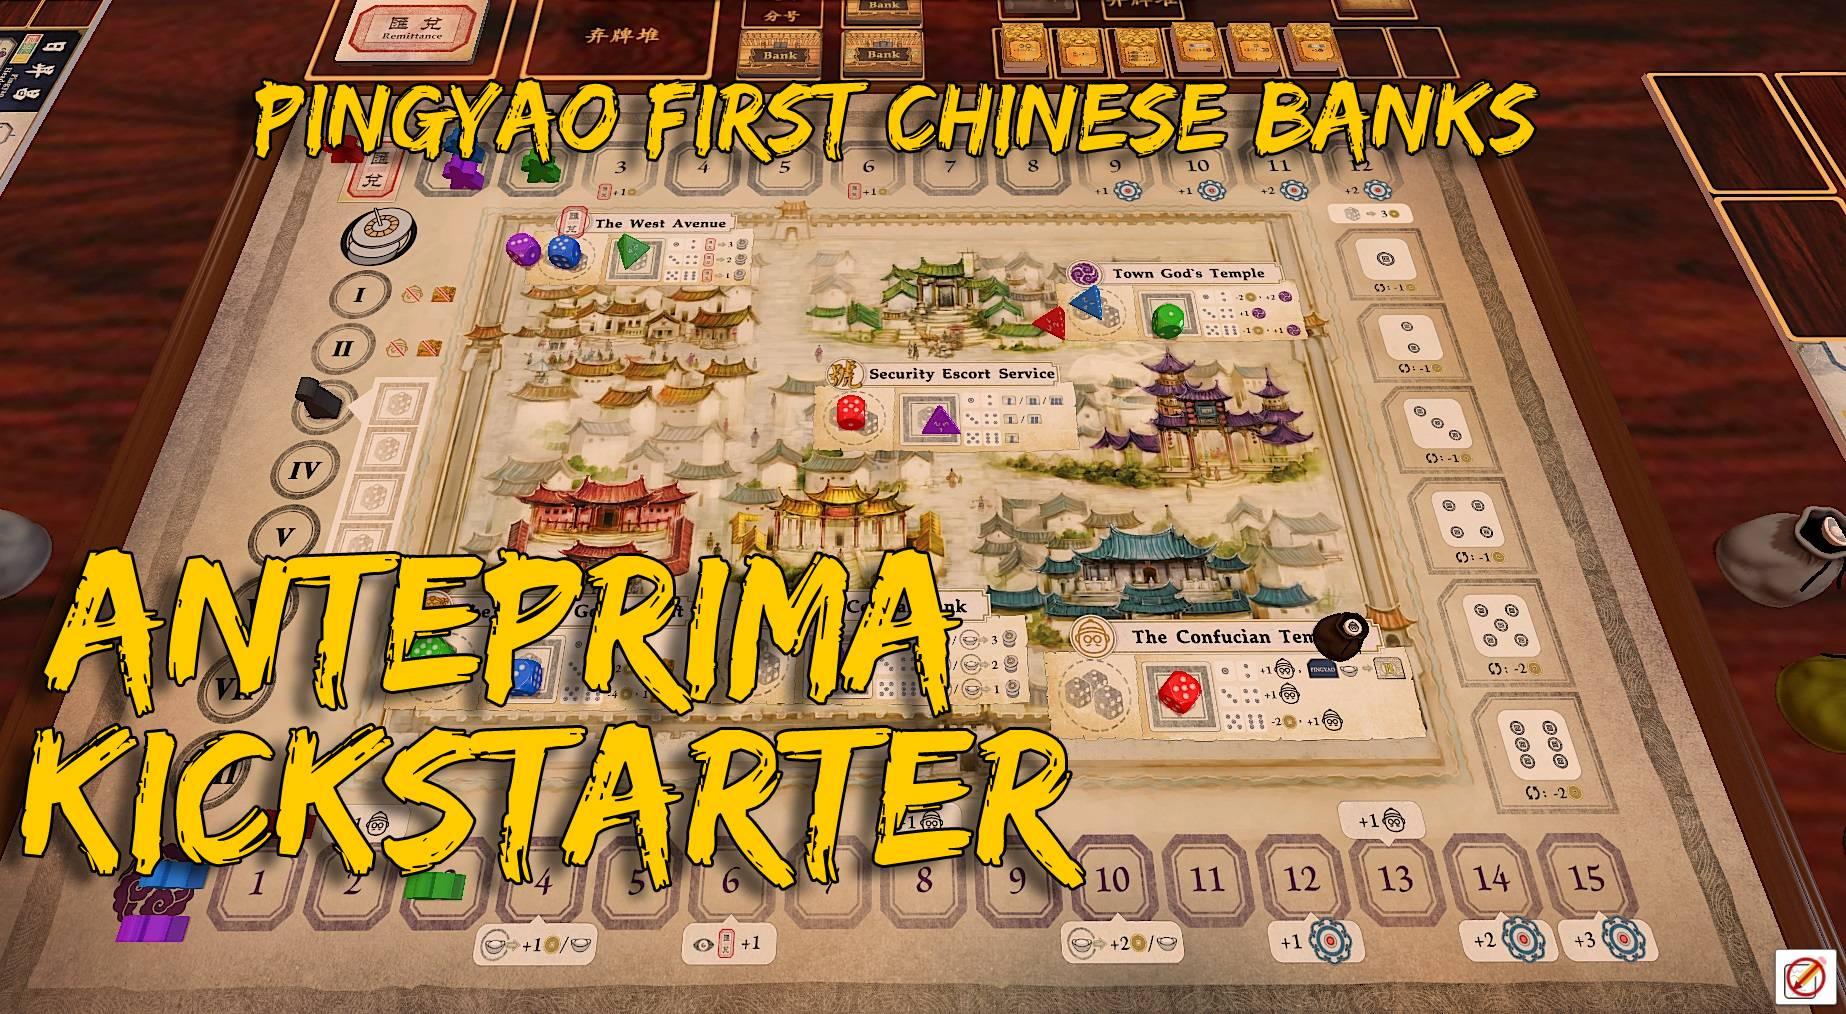 PingYao First Chinese Banks – Anteprima Kickstarter